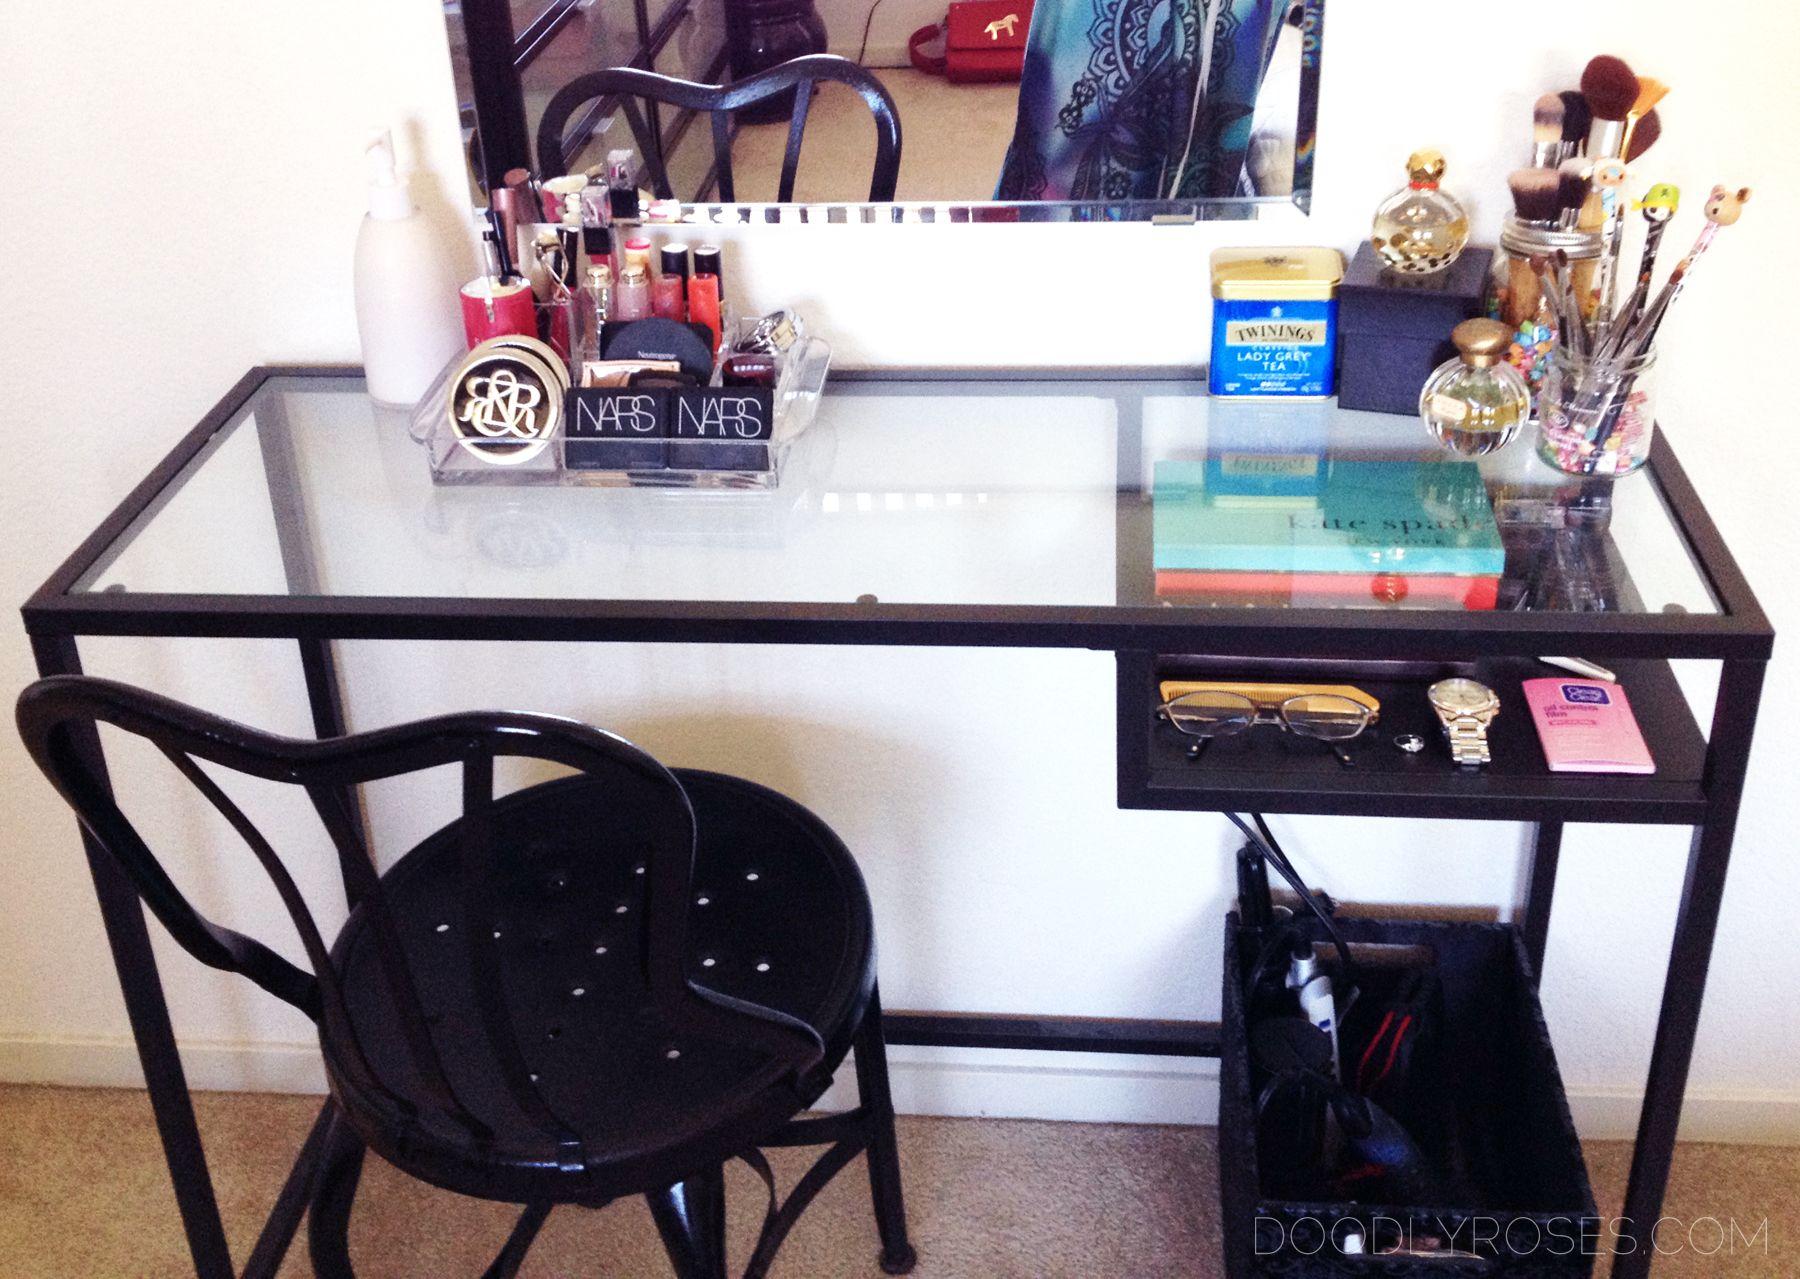 vittsjo laptop table ikea google search favorite places spaces pinterest. Black Bedroom Furniture Sets. Home Design Ideas